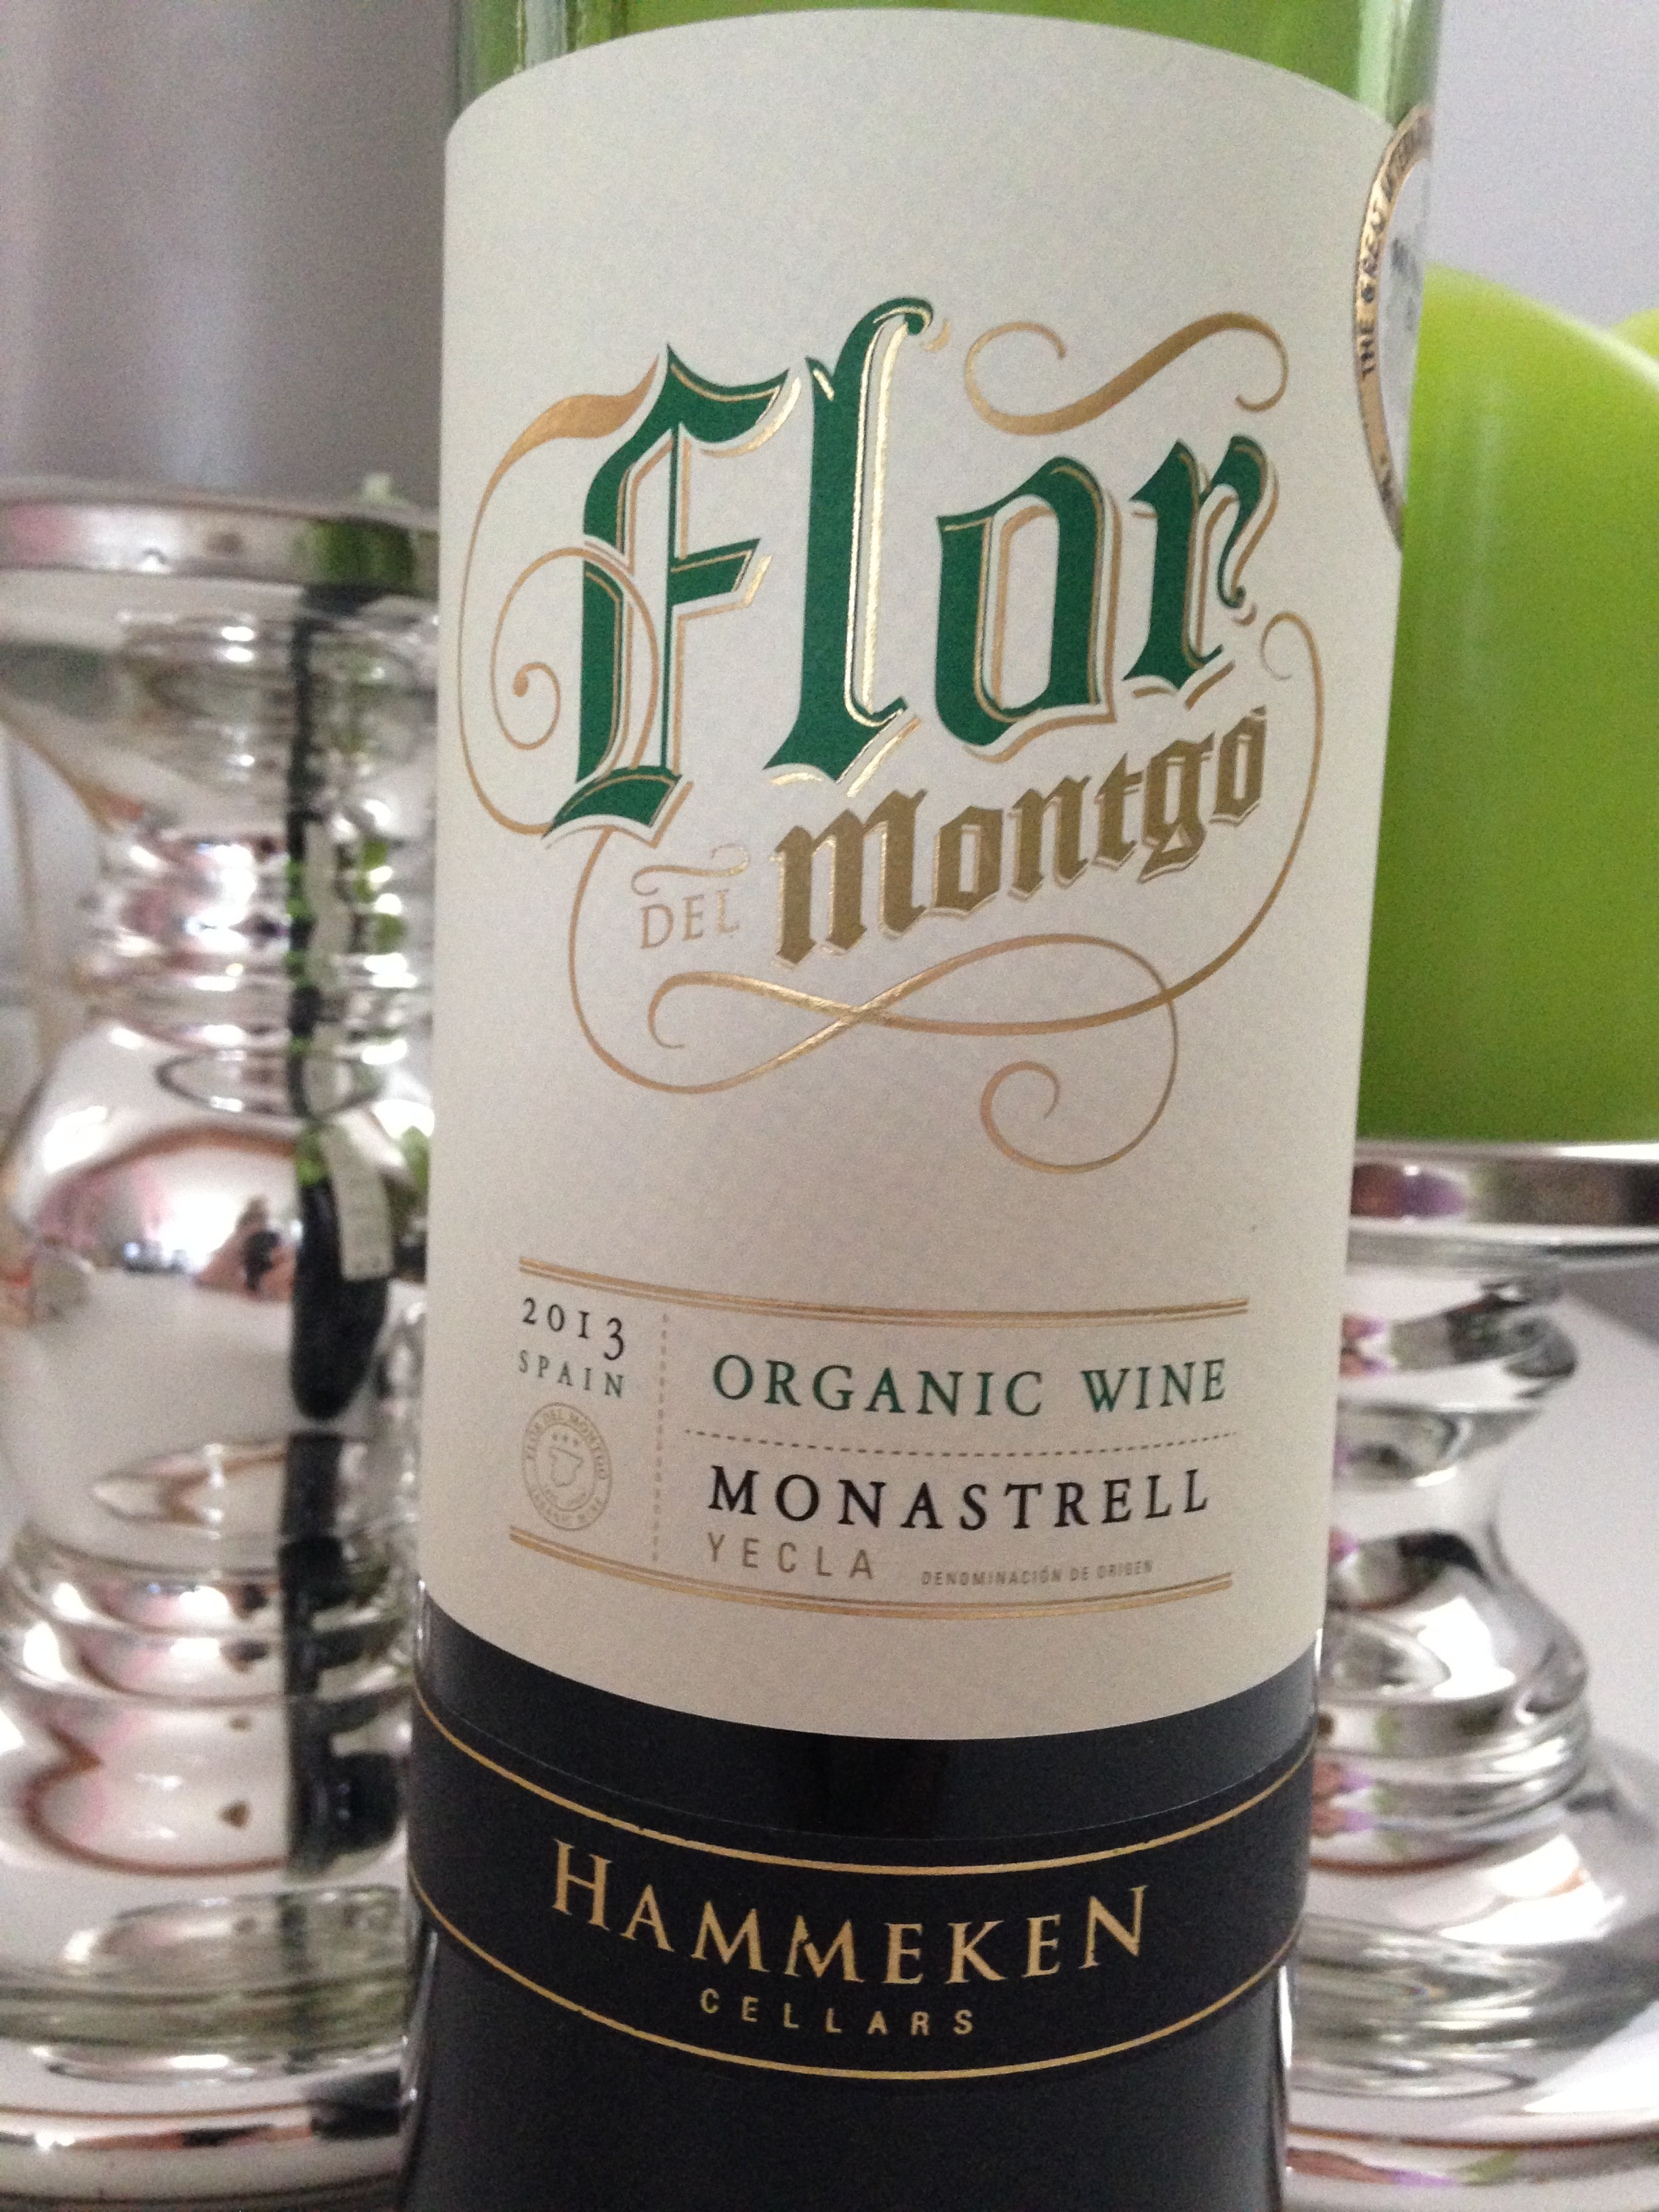 Flor Montgo Organic Wine Monastrell 2013